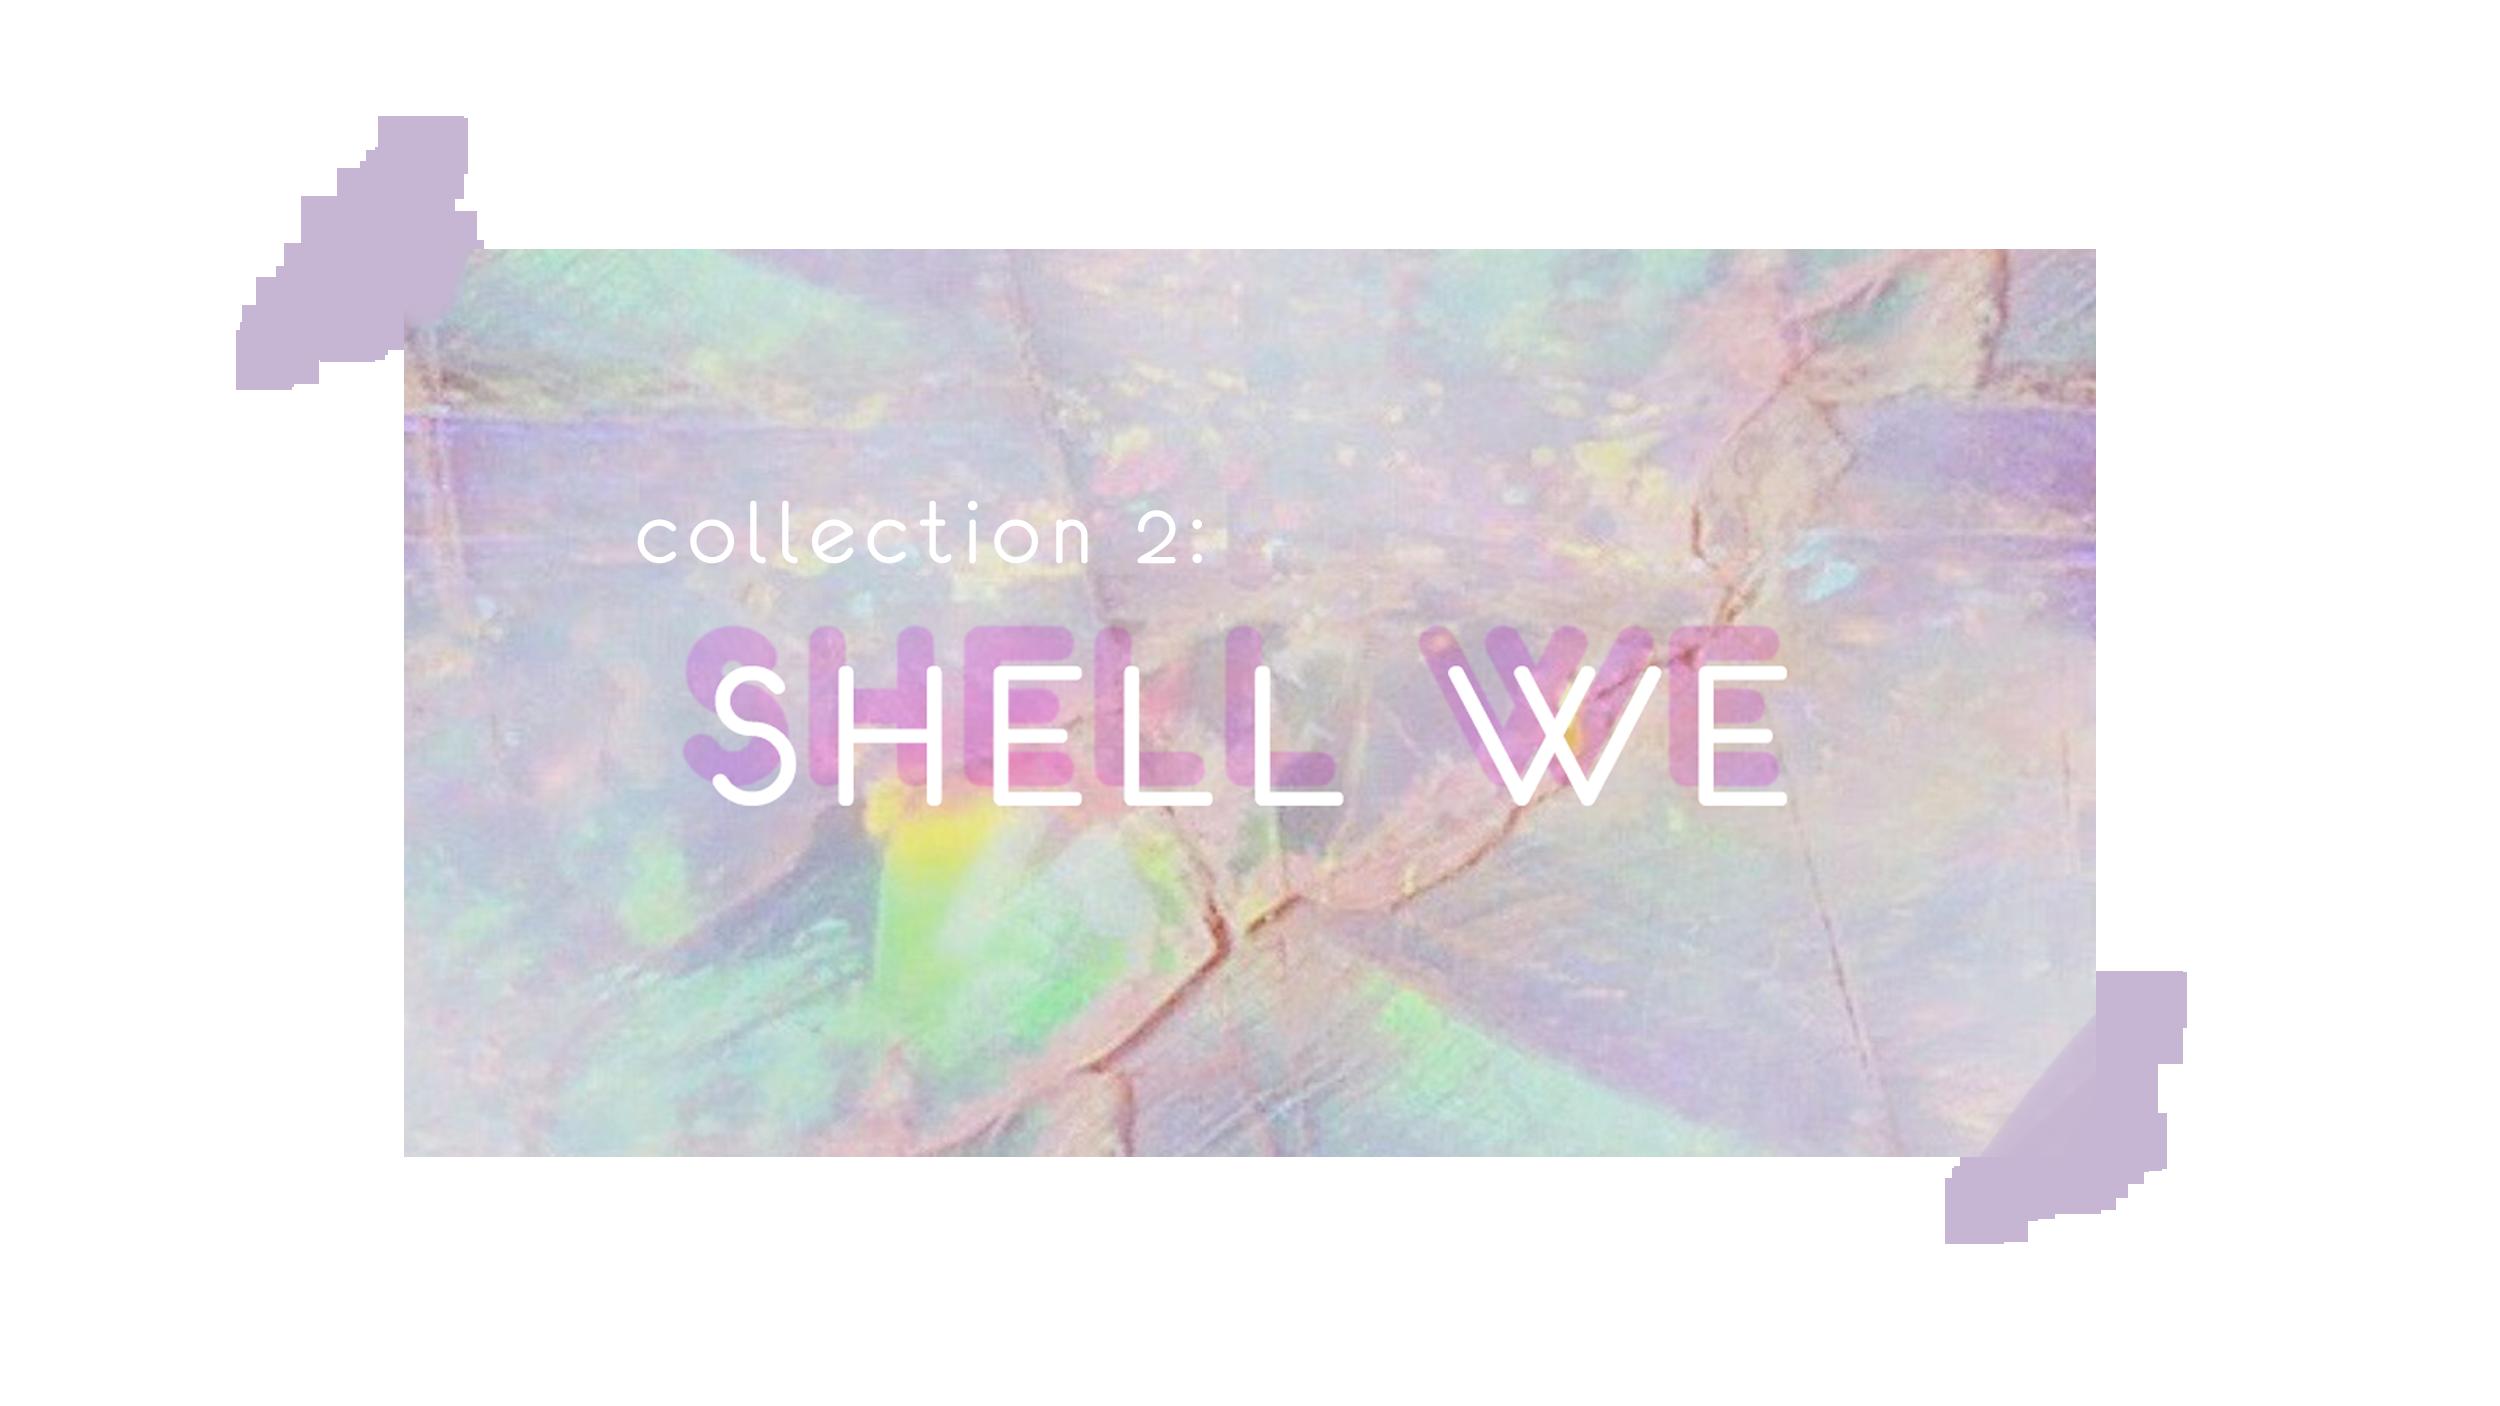 shellwebanner.png